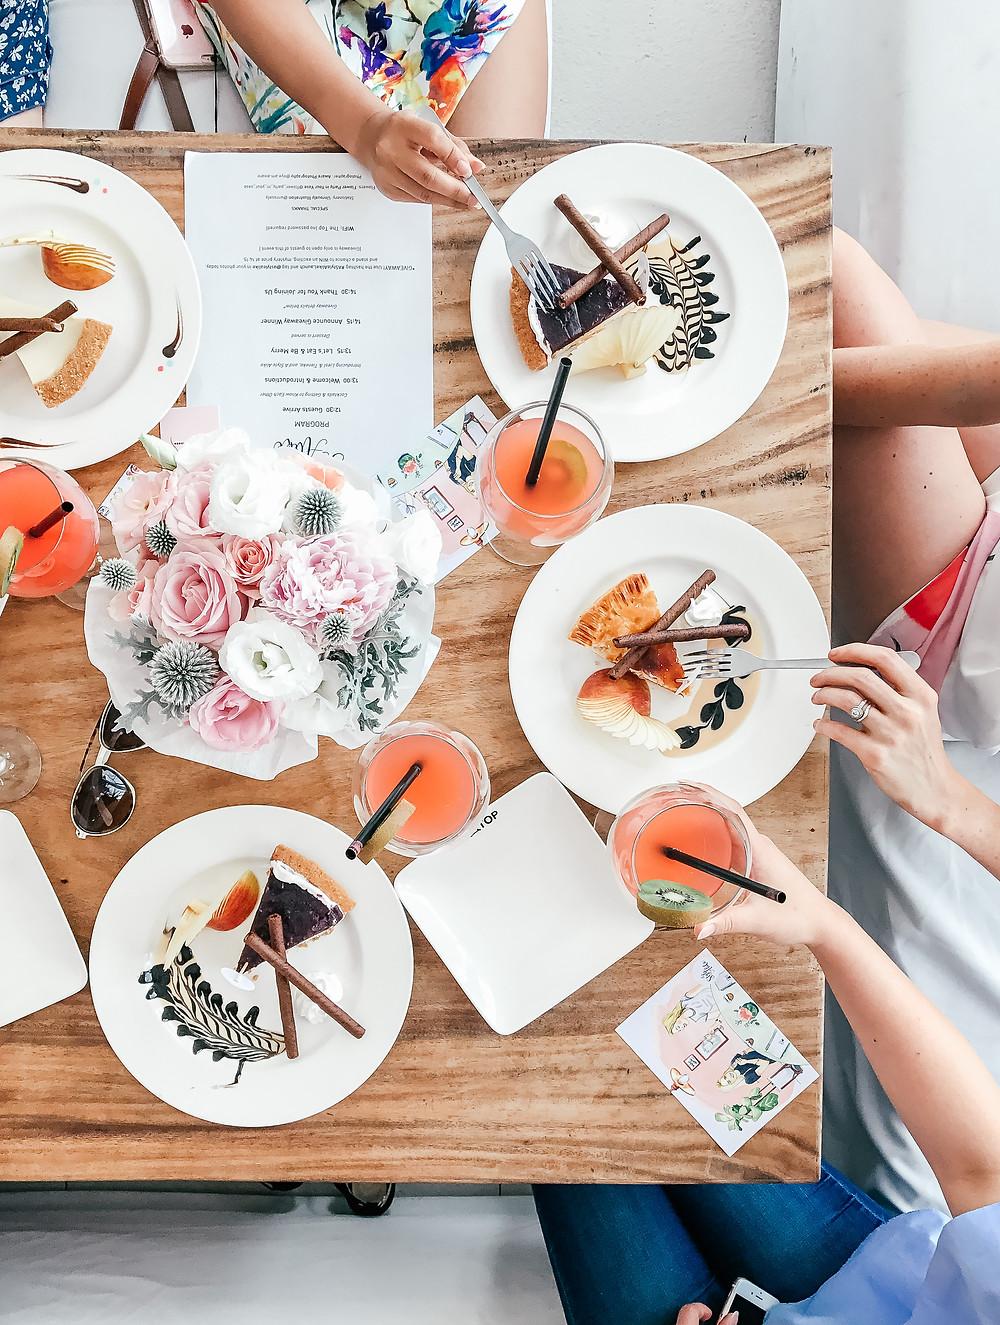 Taipei Bloggers | Lifestyle | A Style Alike